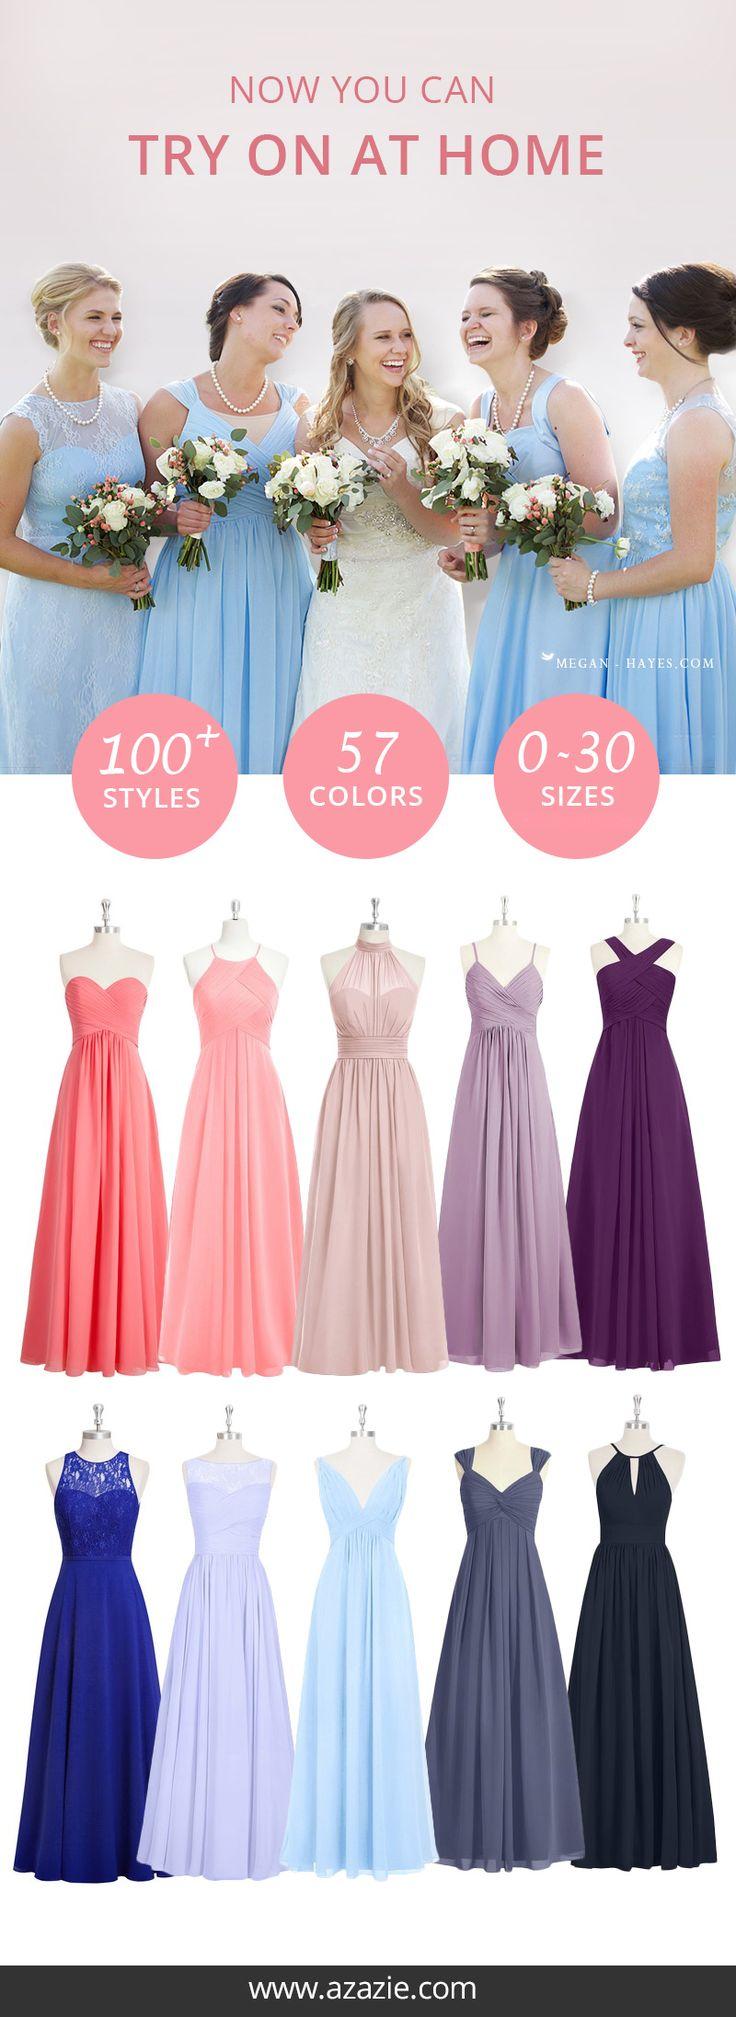 85 best Wedding dresses images on Pinterest | Ball gown, Bride ...